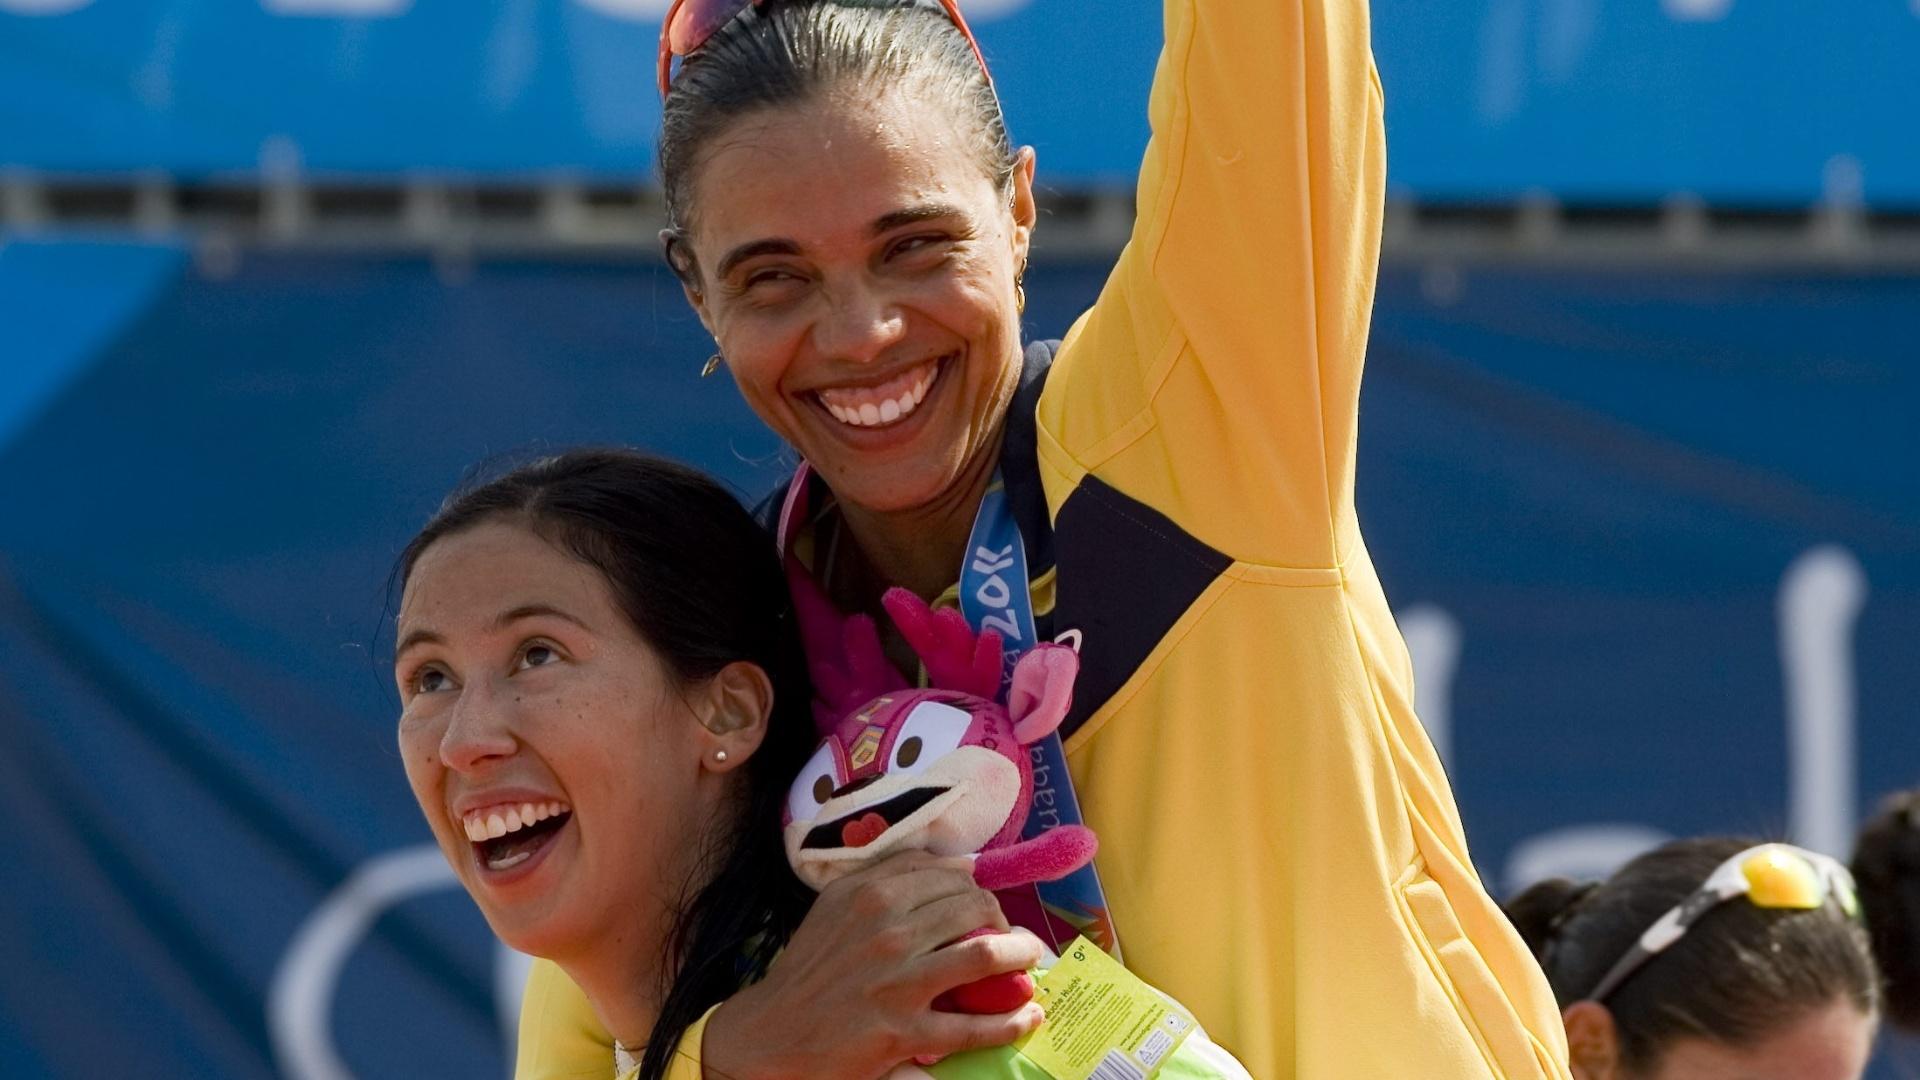 Bibiana Candela carrega Juliana após final no vôlei de praia (21/10/2011)